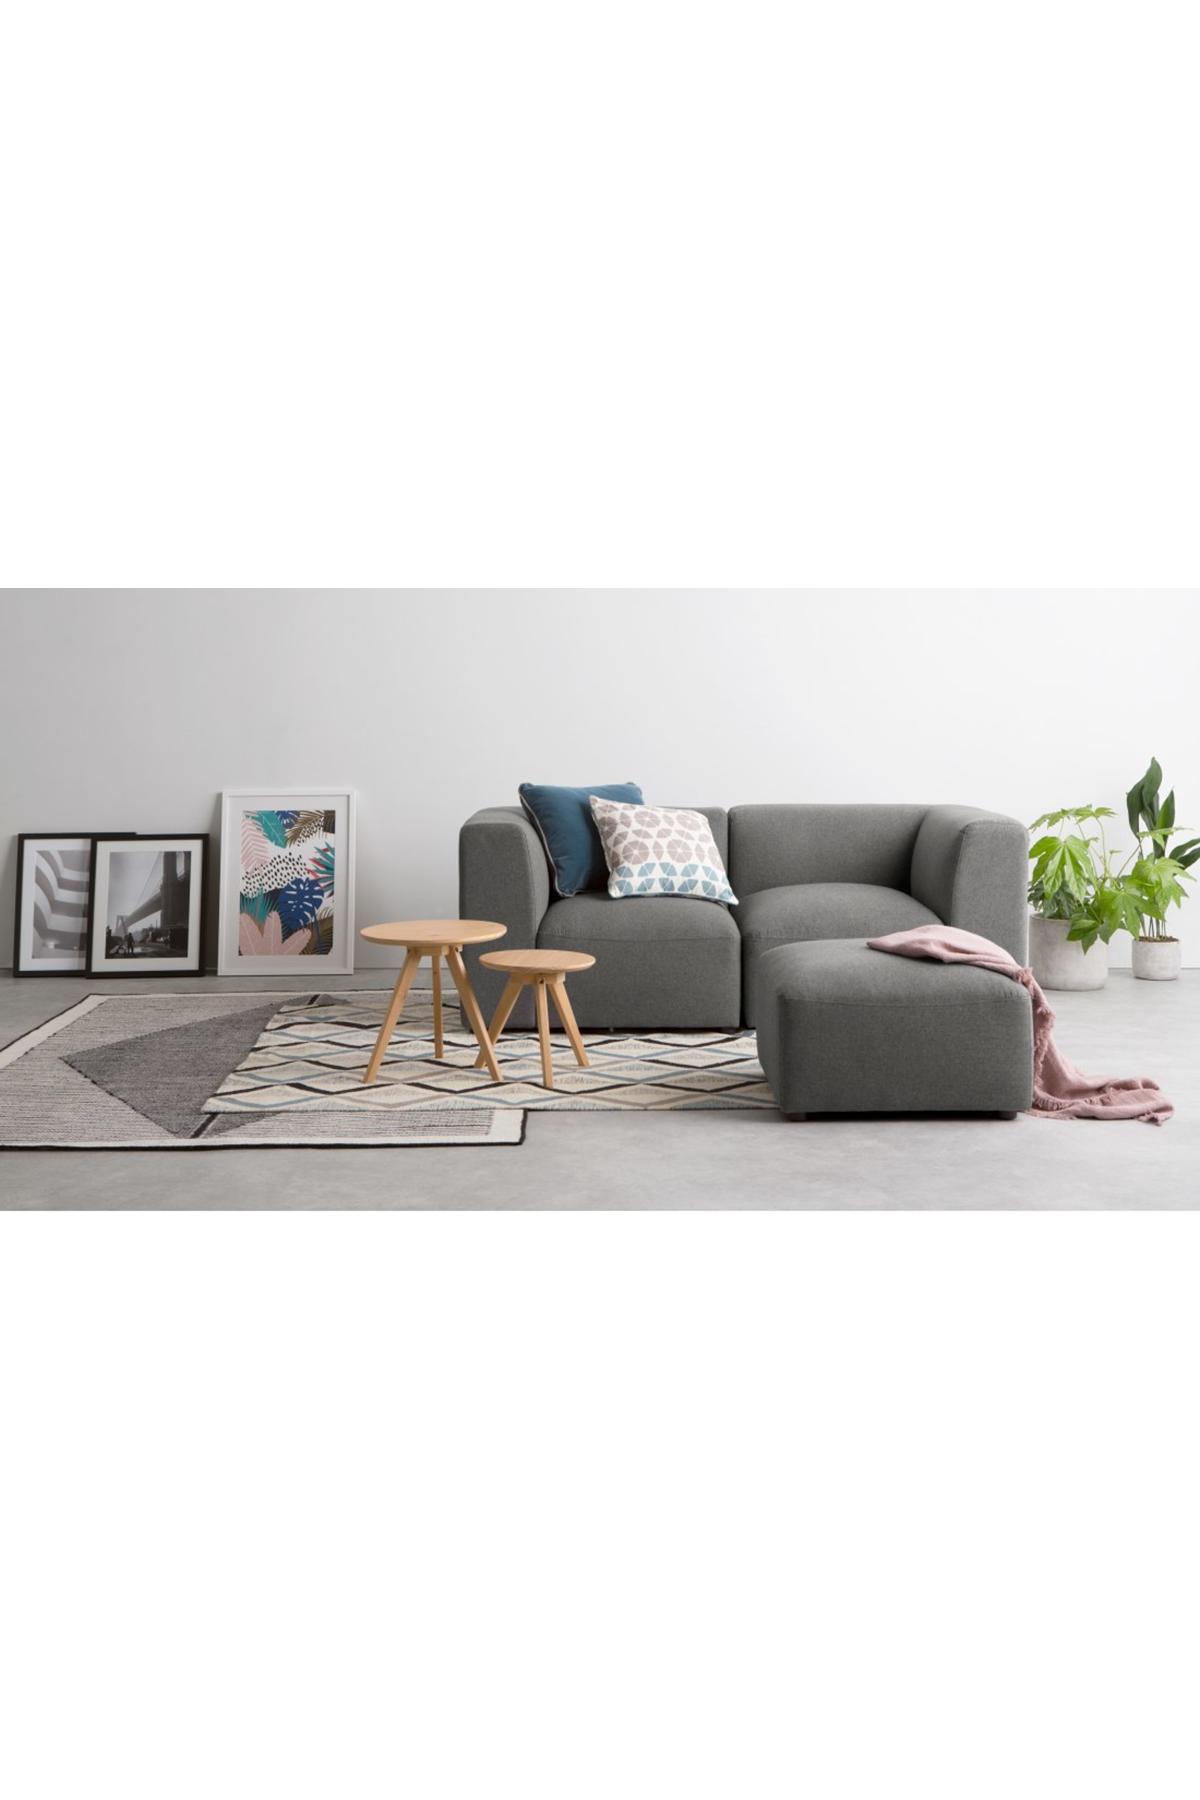 Juno 2 Seater Sofa With Footstool Marl Grey 2 Seater Sofa Sofa Modular Sofa